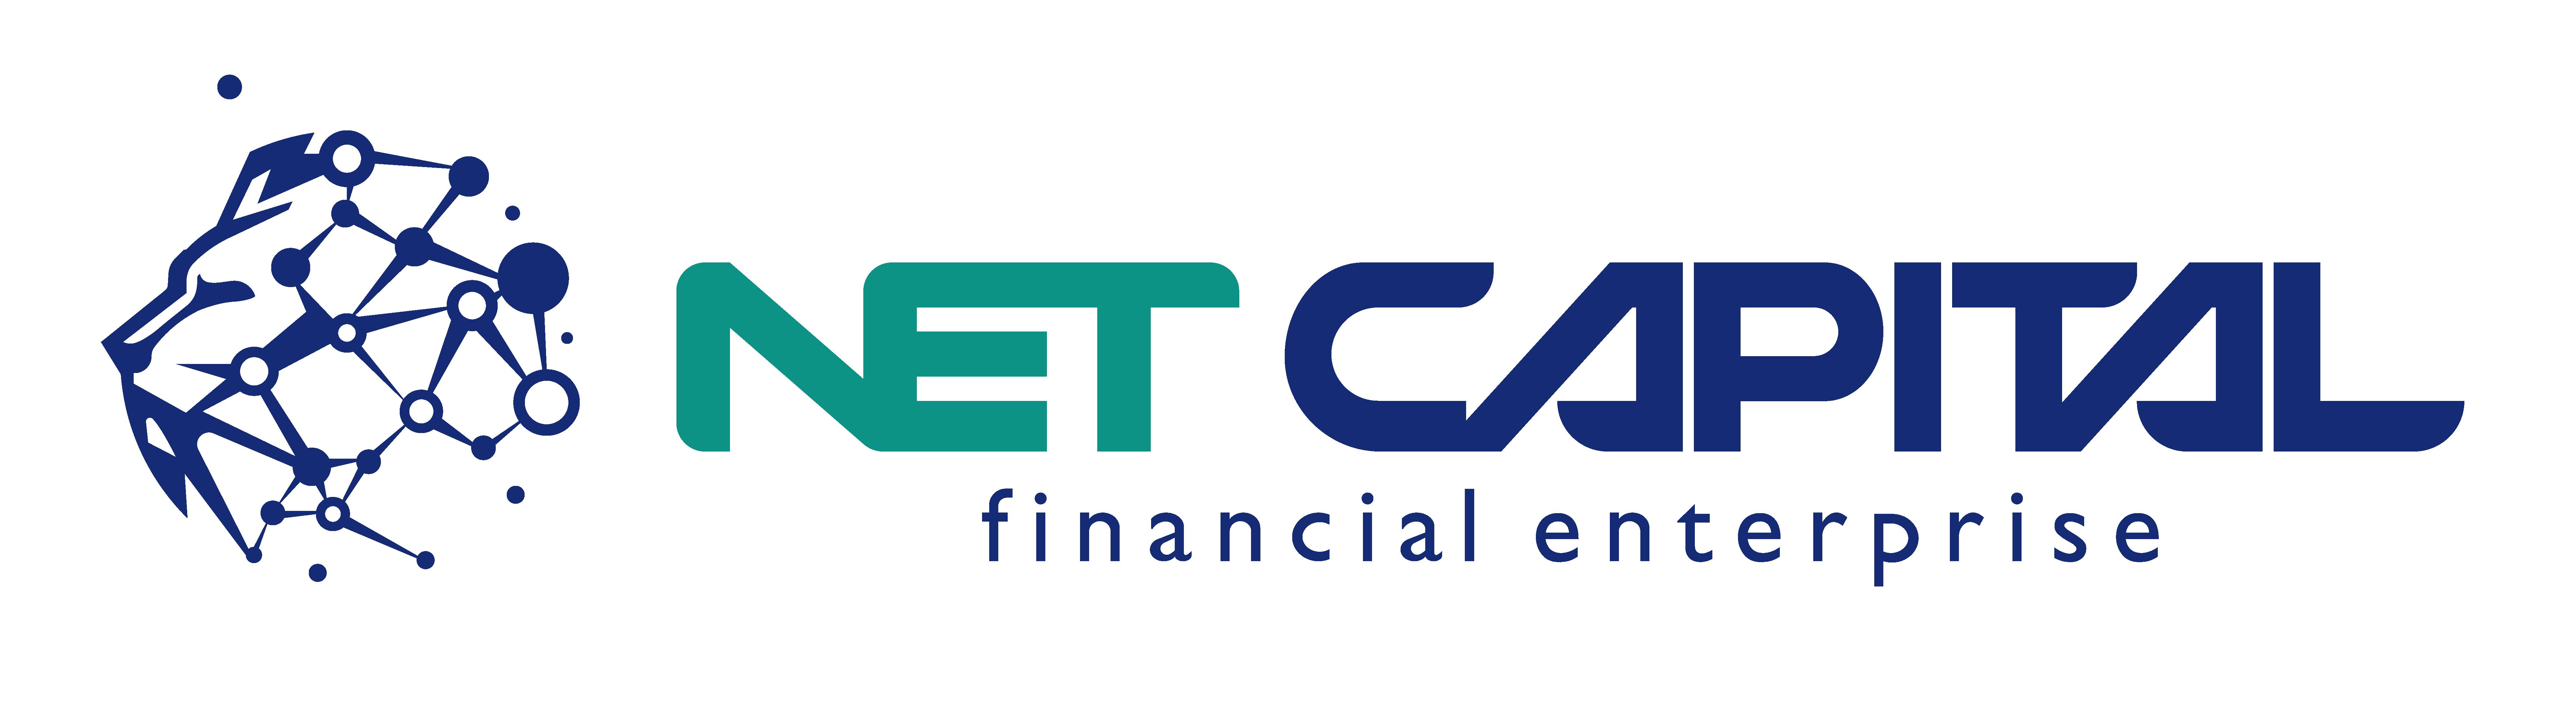 netcapital